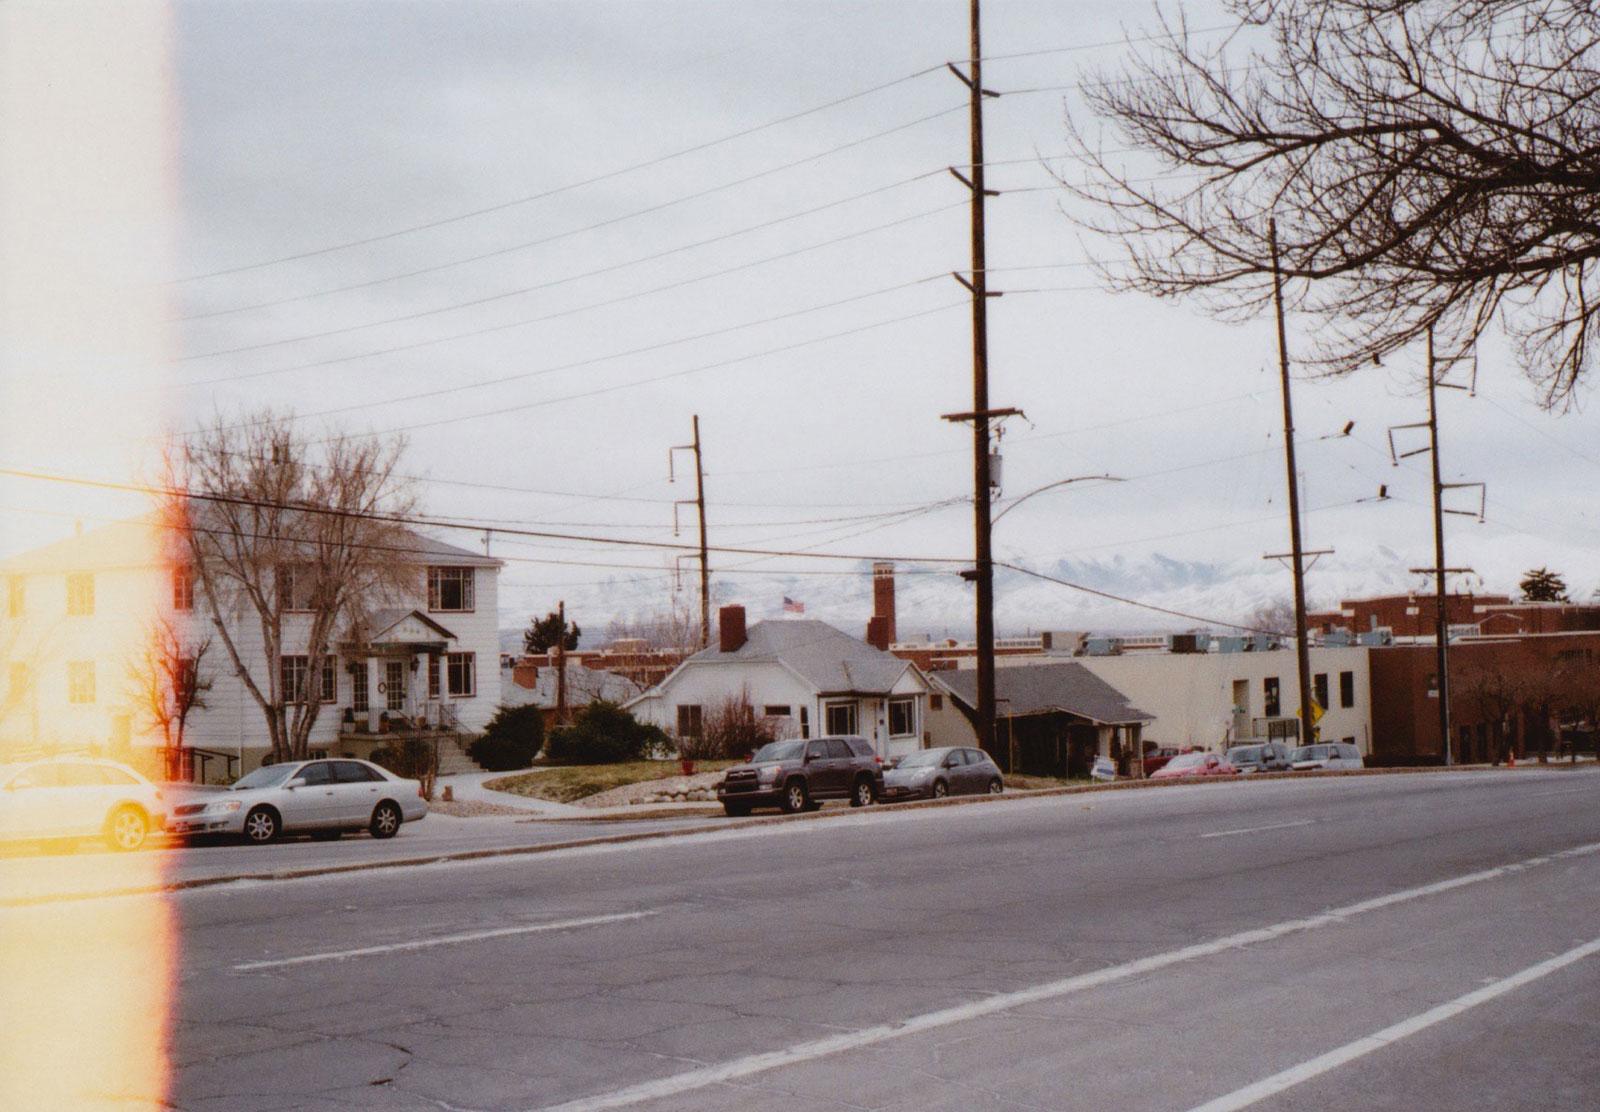 Mountains behind street